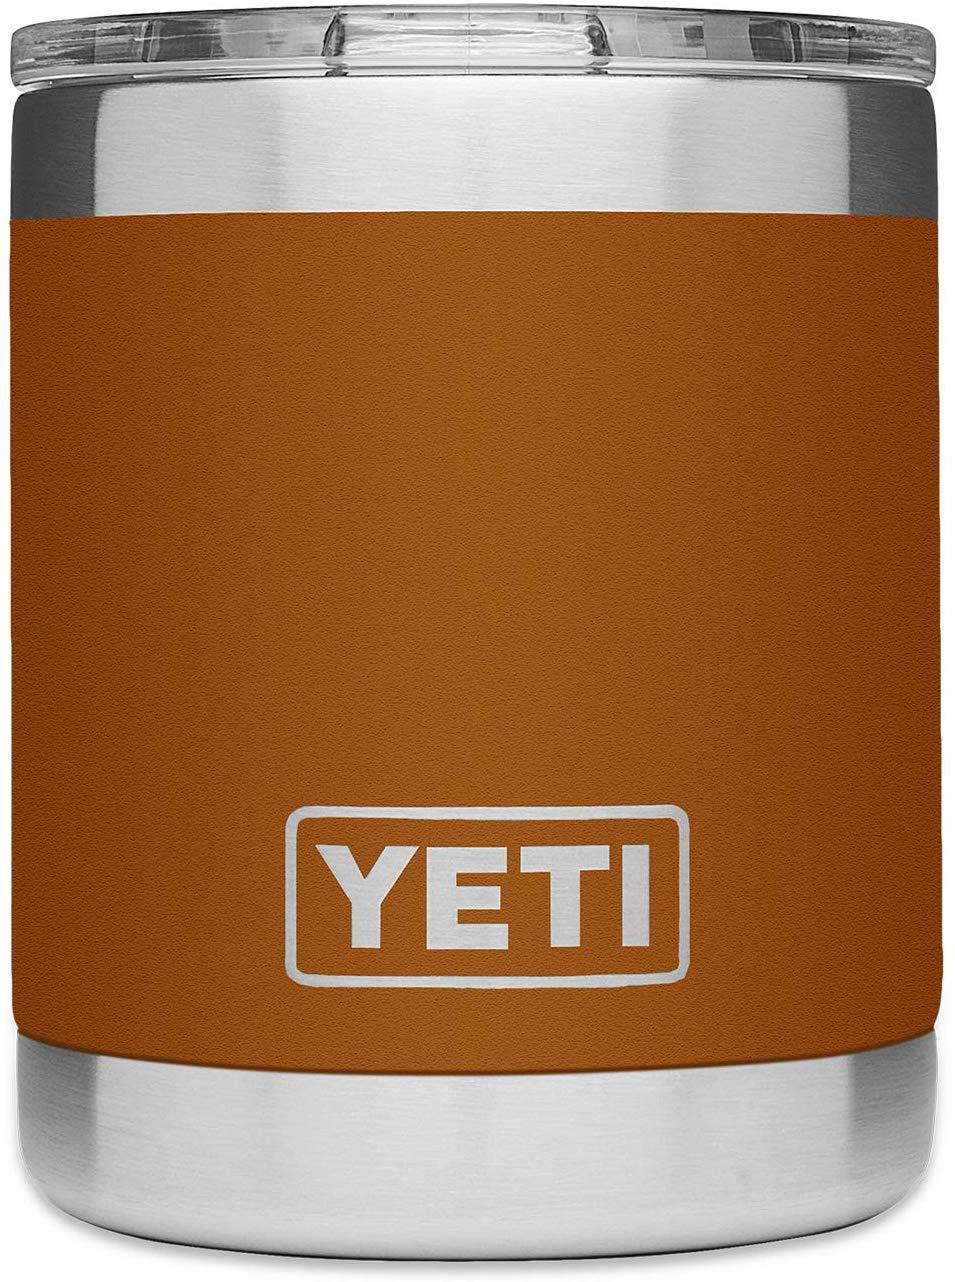 photo of a yeti tumbler